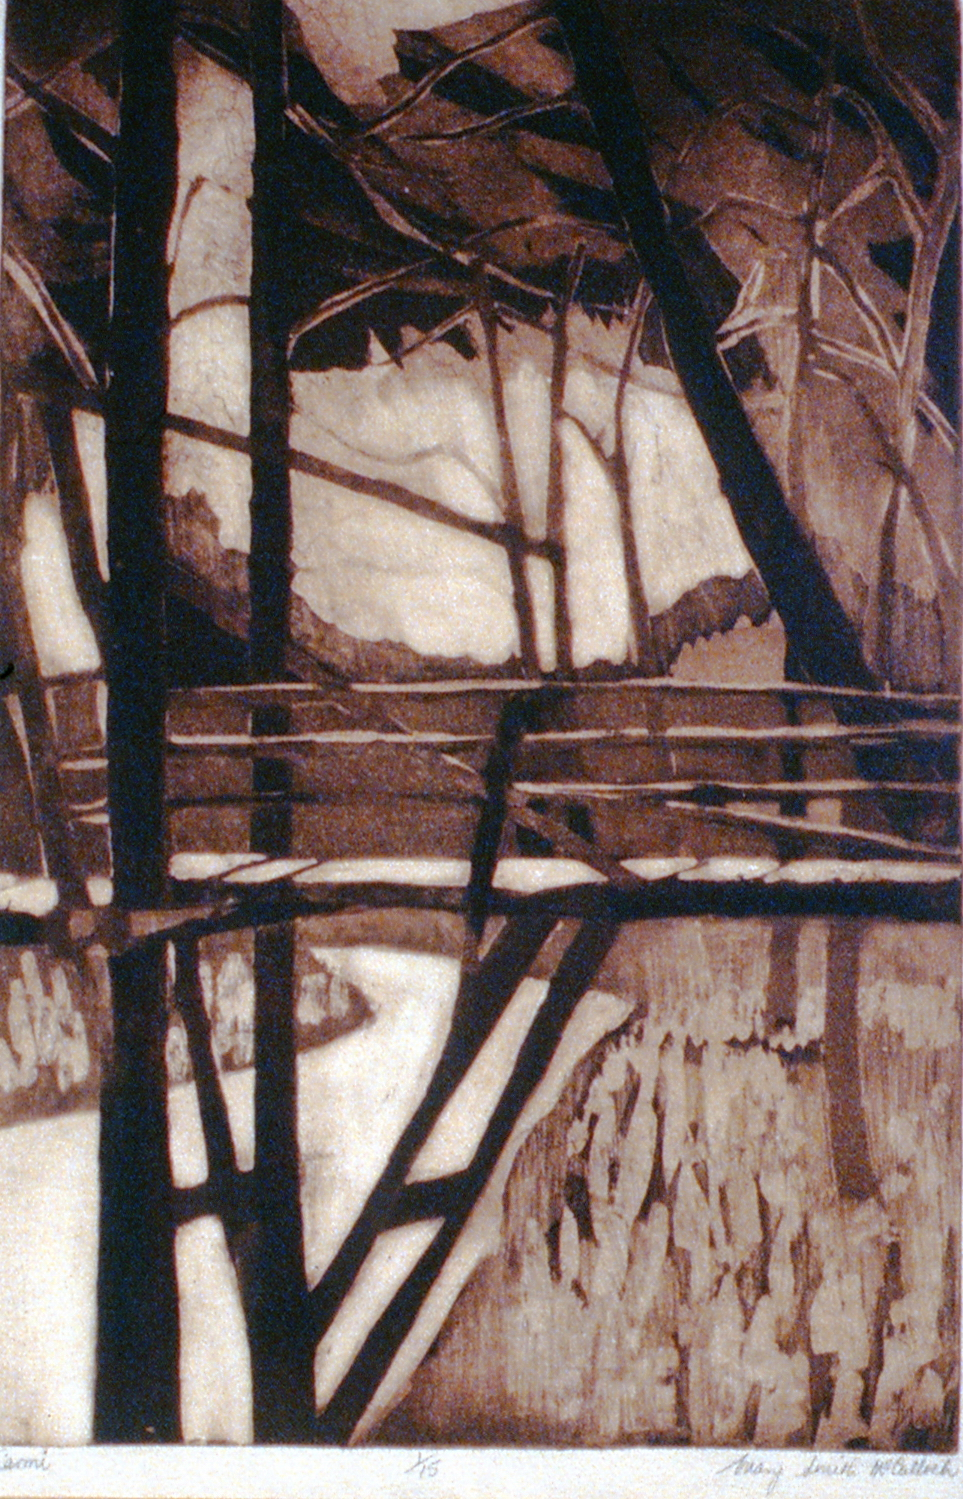 Carmi , n.d., Mary McCulloch, etching & aquatint, 48 x 31.5cm, 1995.01.07. Gift of the Okanagan Mainline Regional Arts Council.